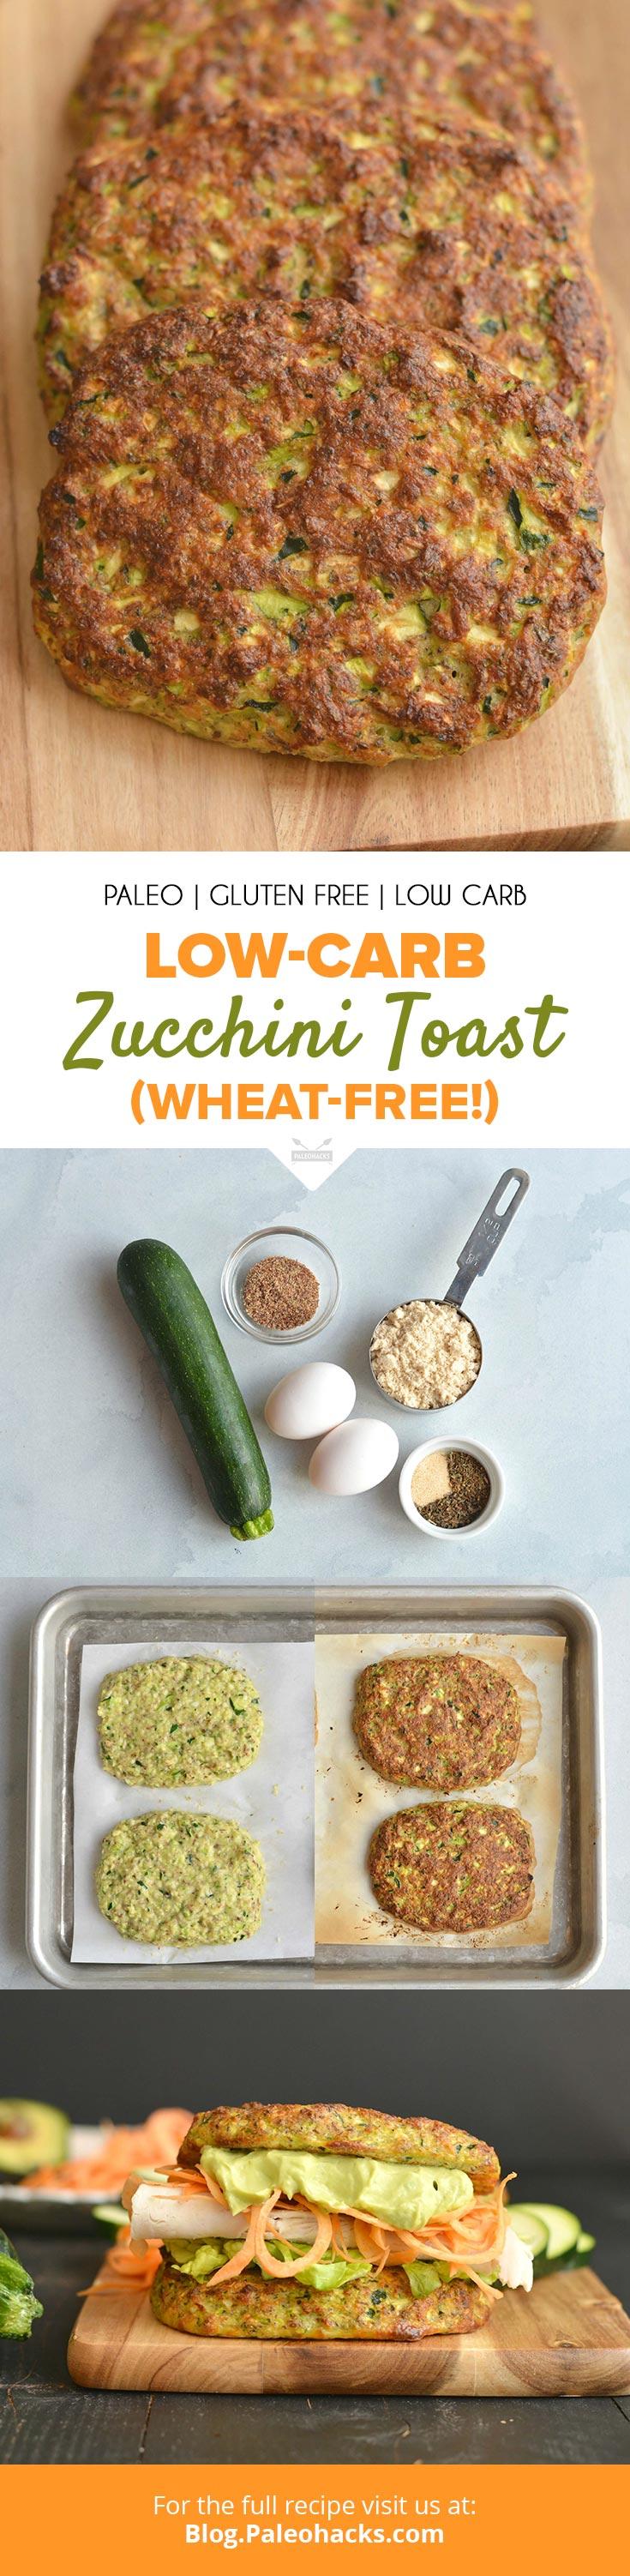 PIN-Low-Carb-Zucchini-Toast.jpg